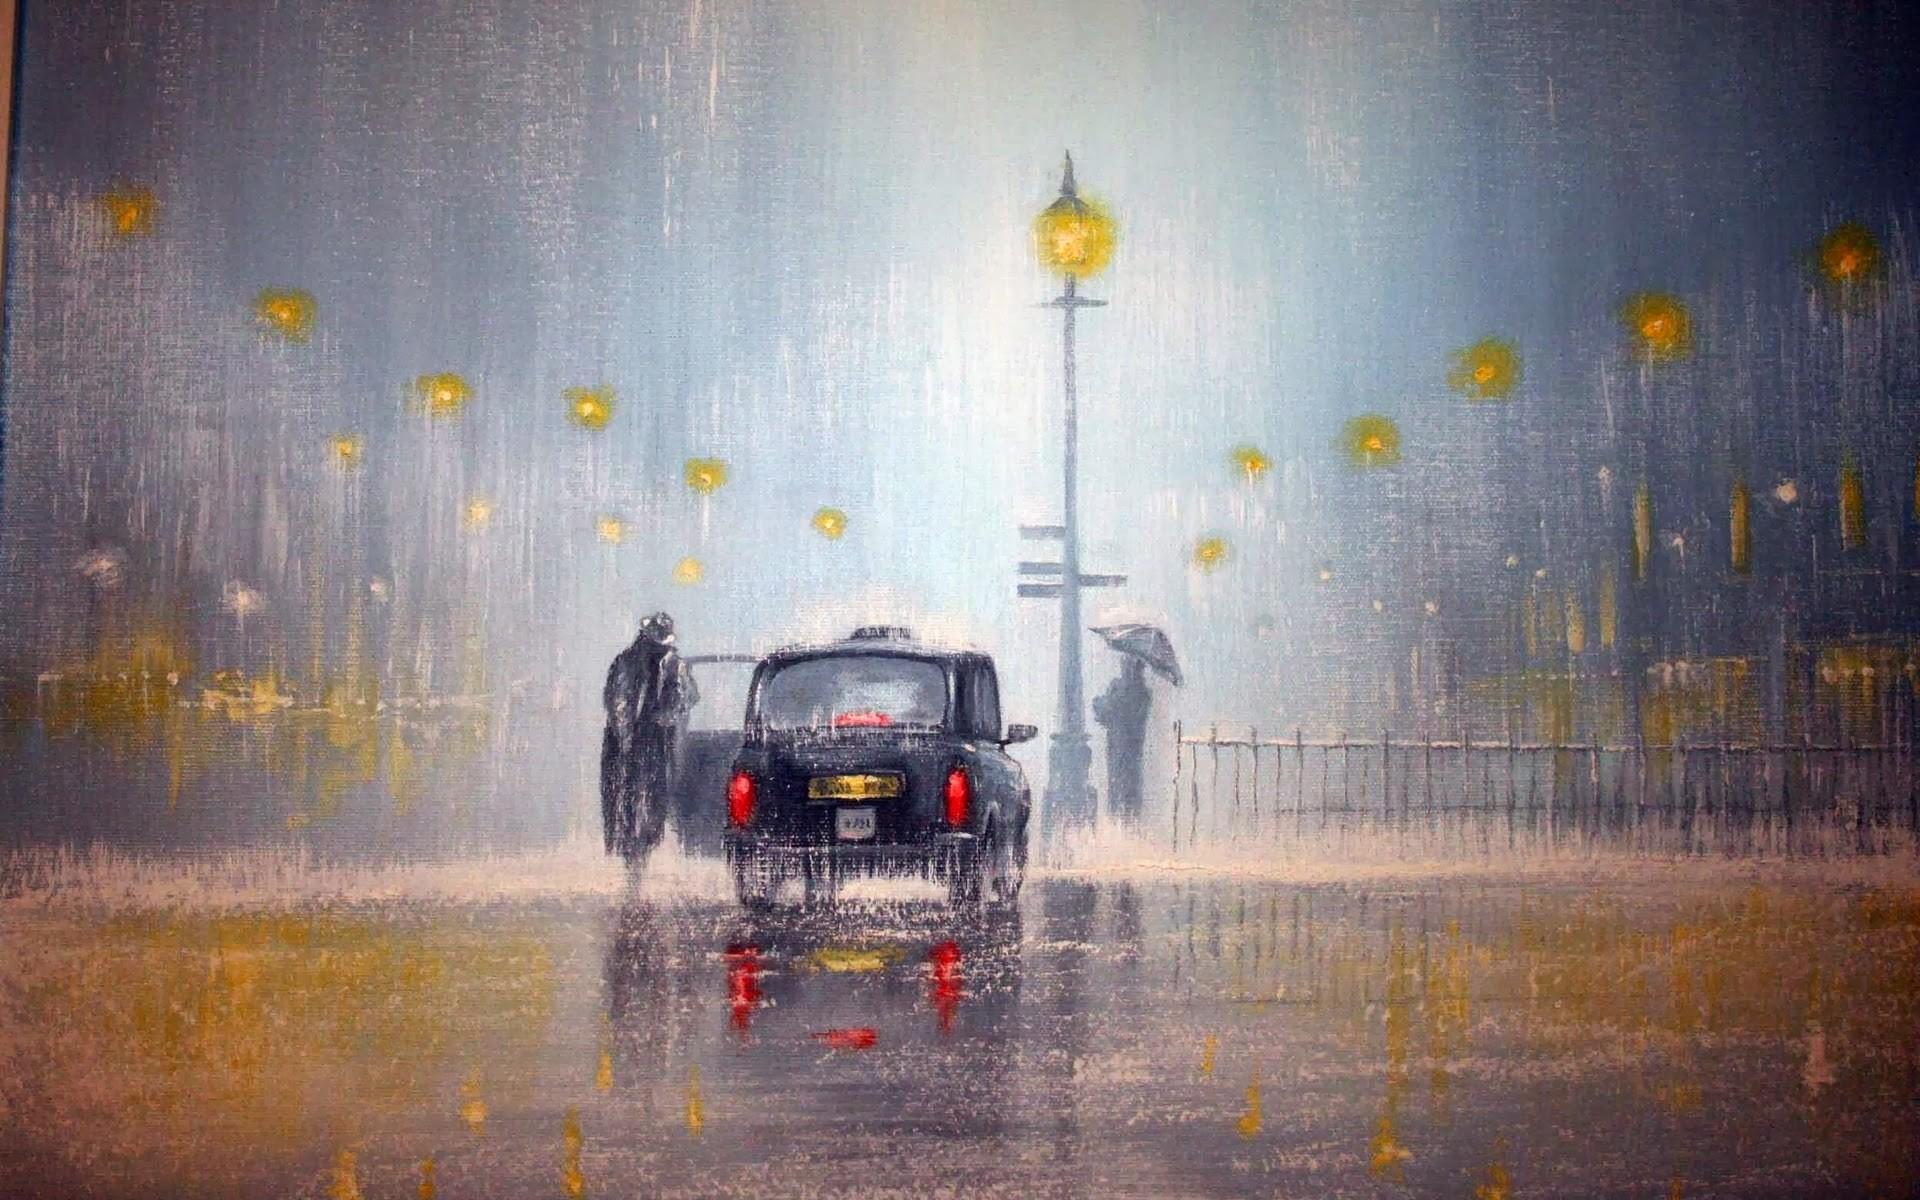 Painting City Reflection Rain Artwork Lantern Evening Morning Mist Jeff Rowland Fog Weather Screenshot Atmospheric Phenomenon